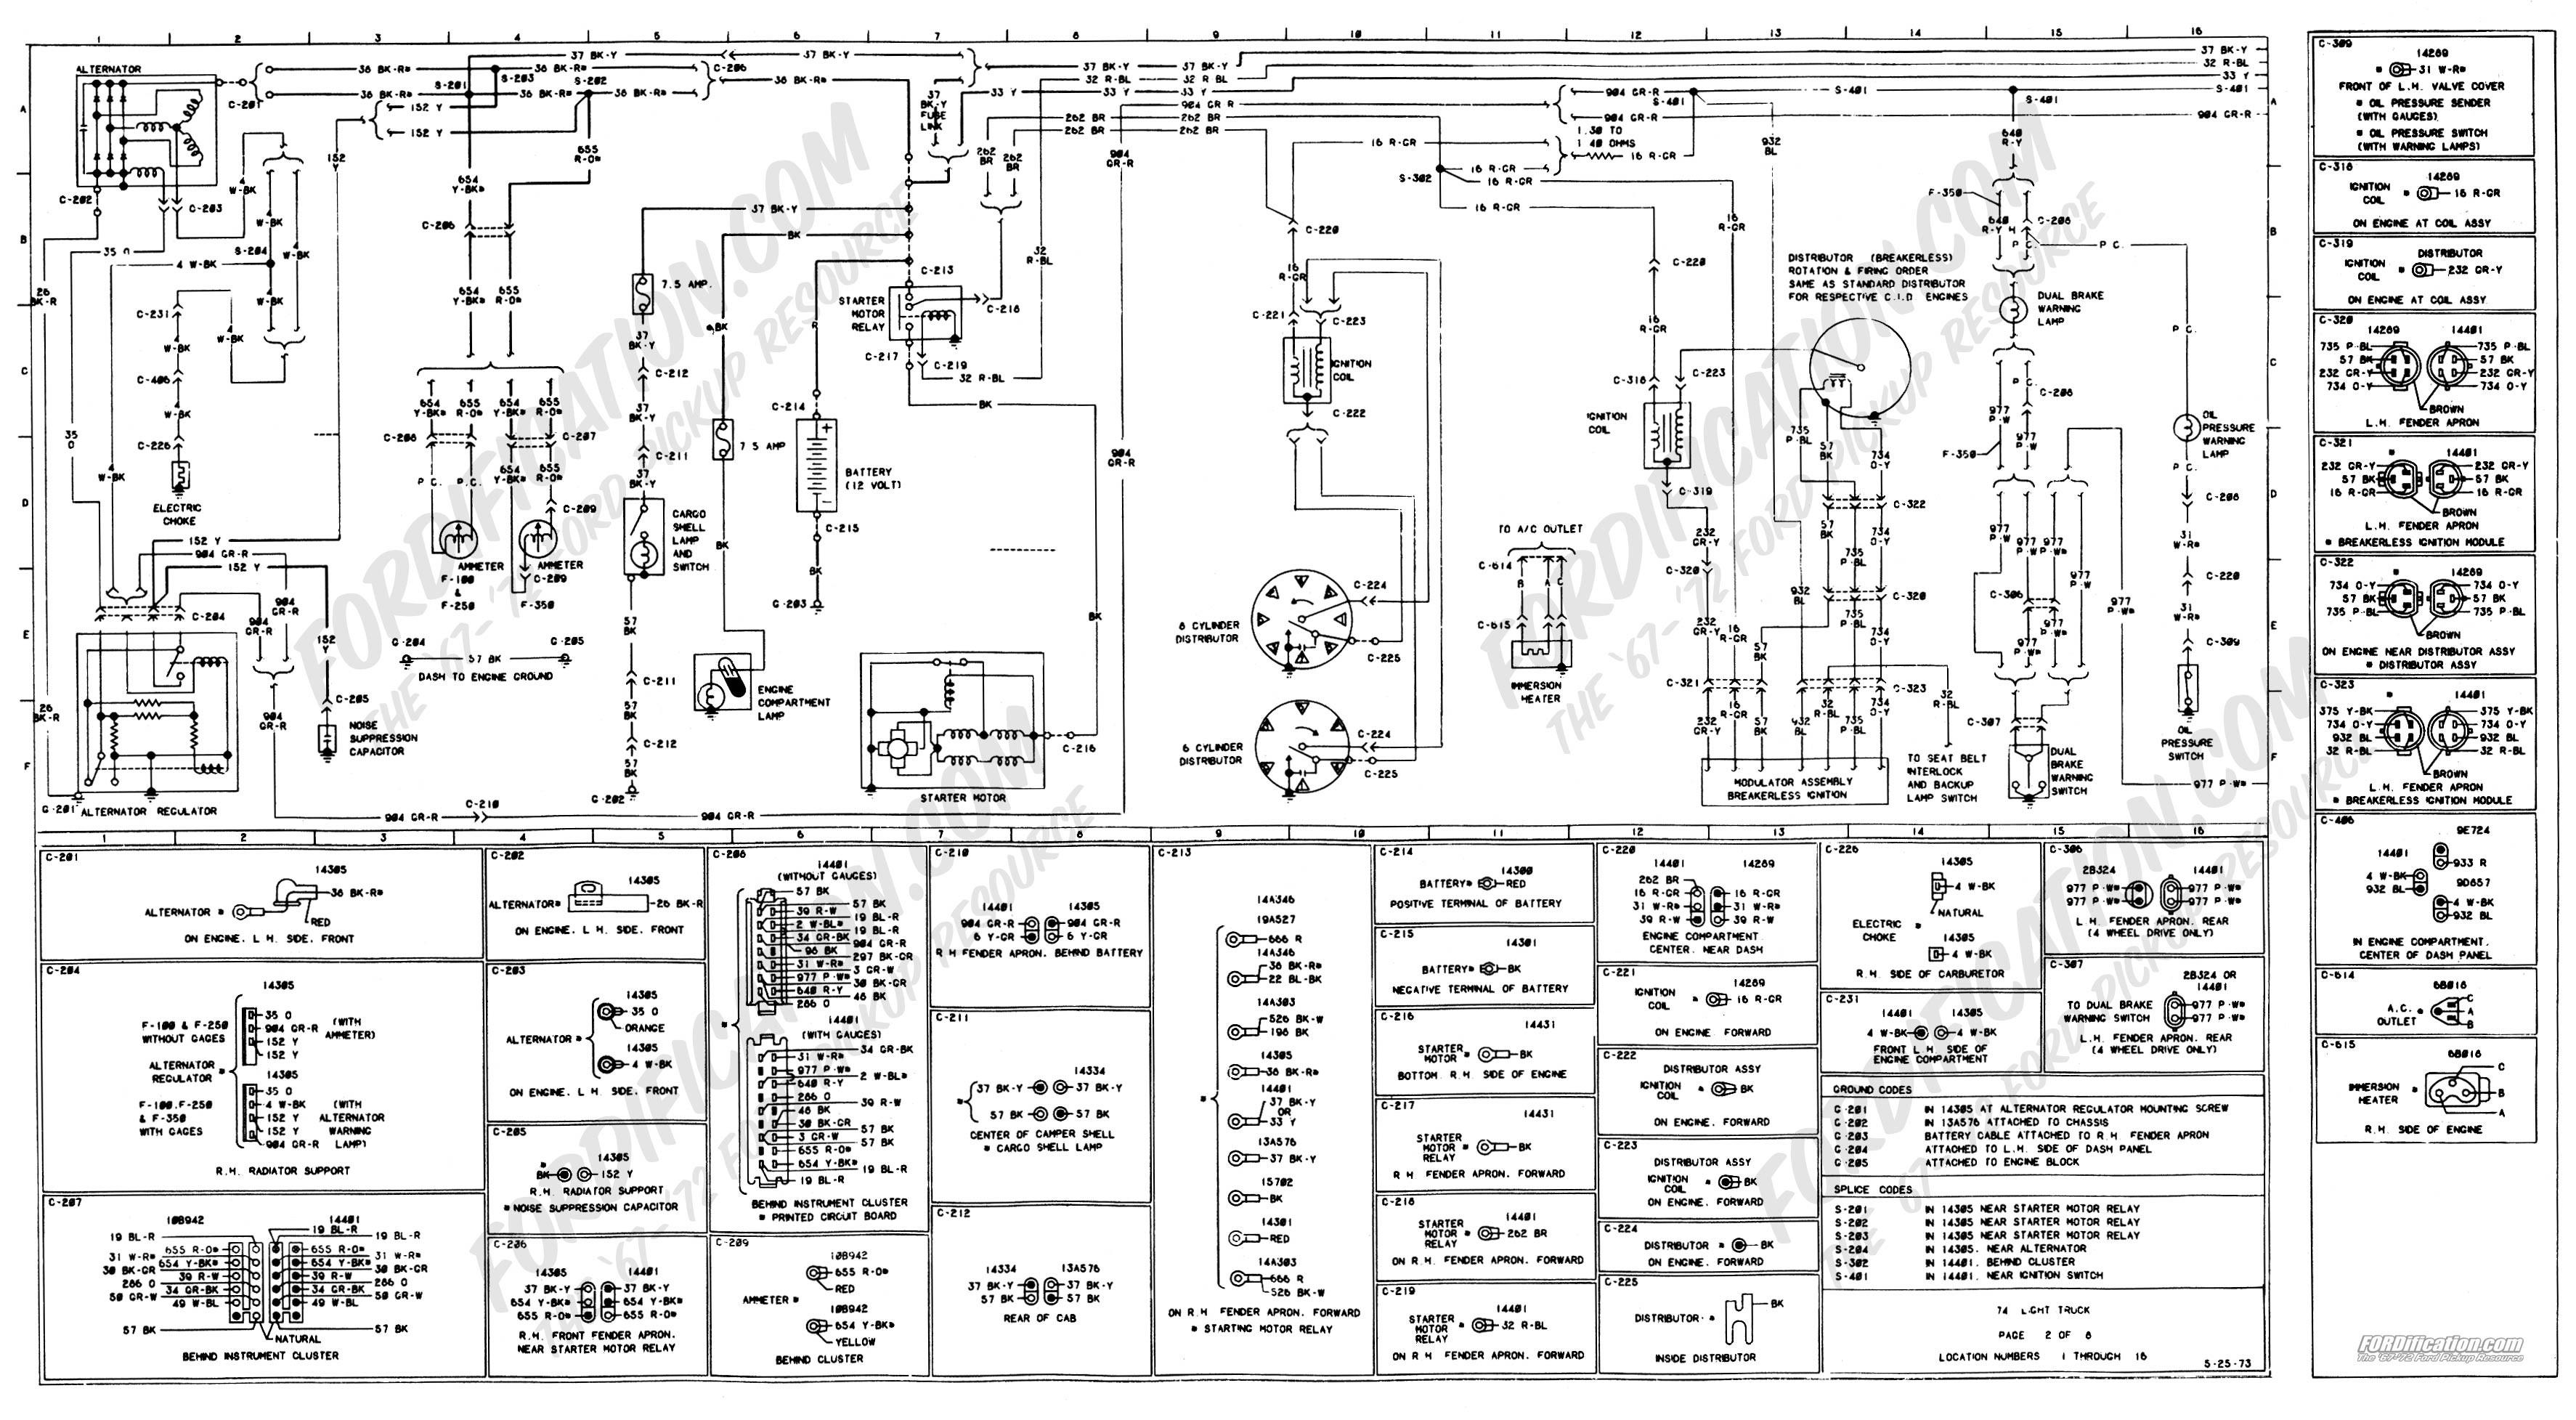 1975 Ford F600 Wiring Diagram Ford F Wiring Diagram on